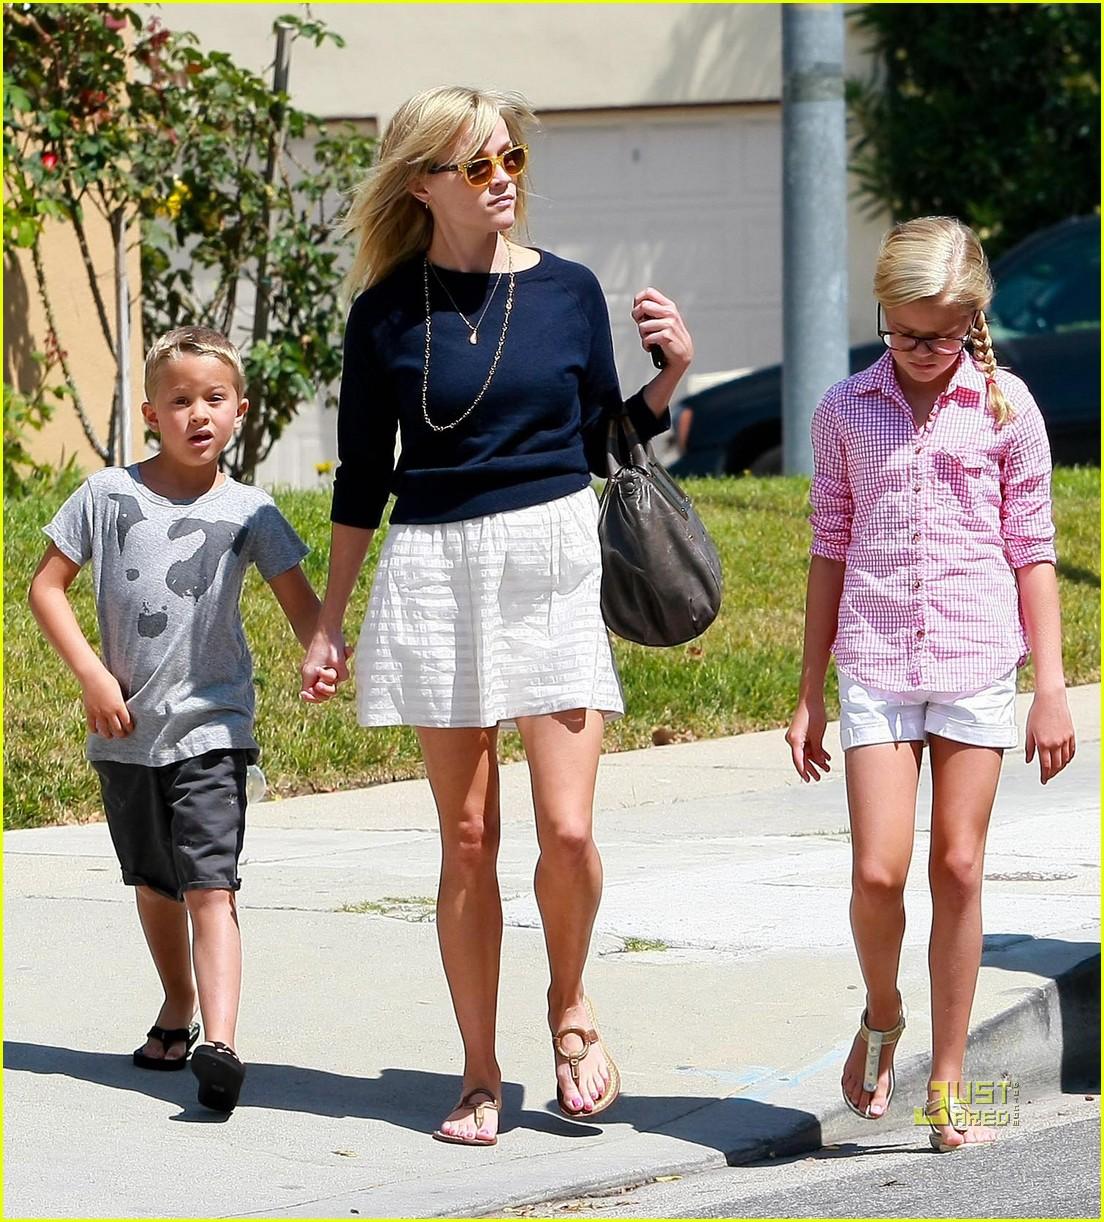 Риз уизерспун и ее муж и дети фото